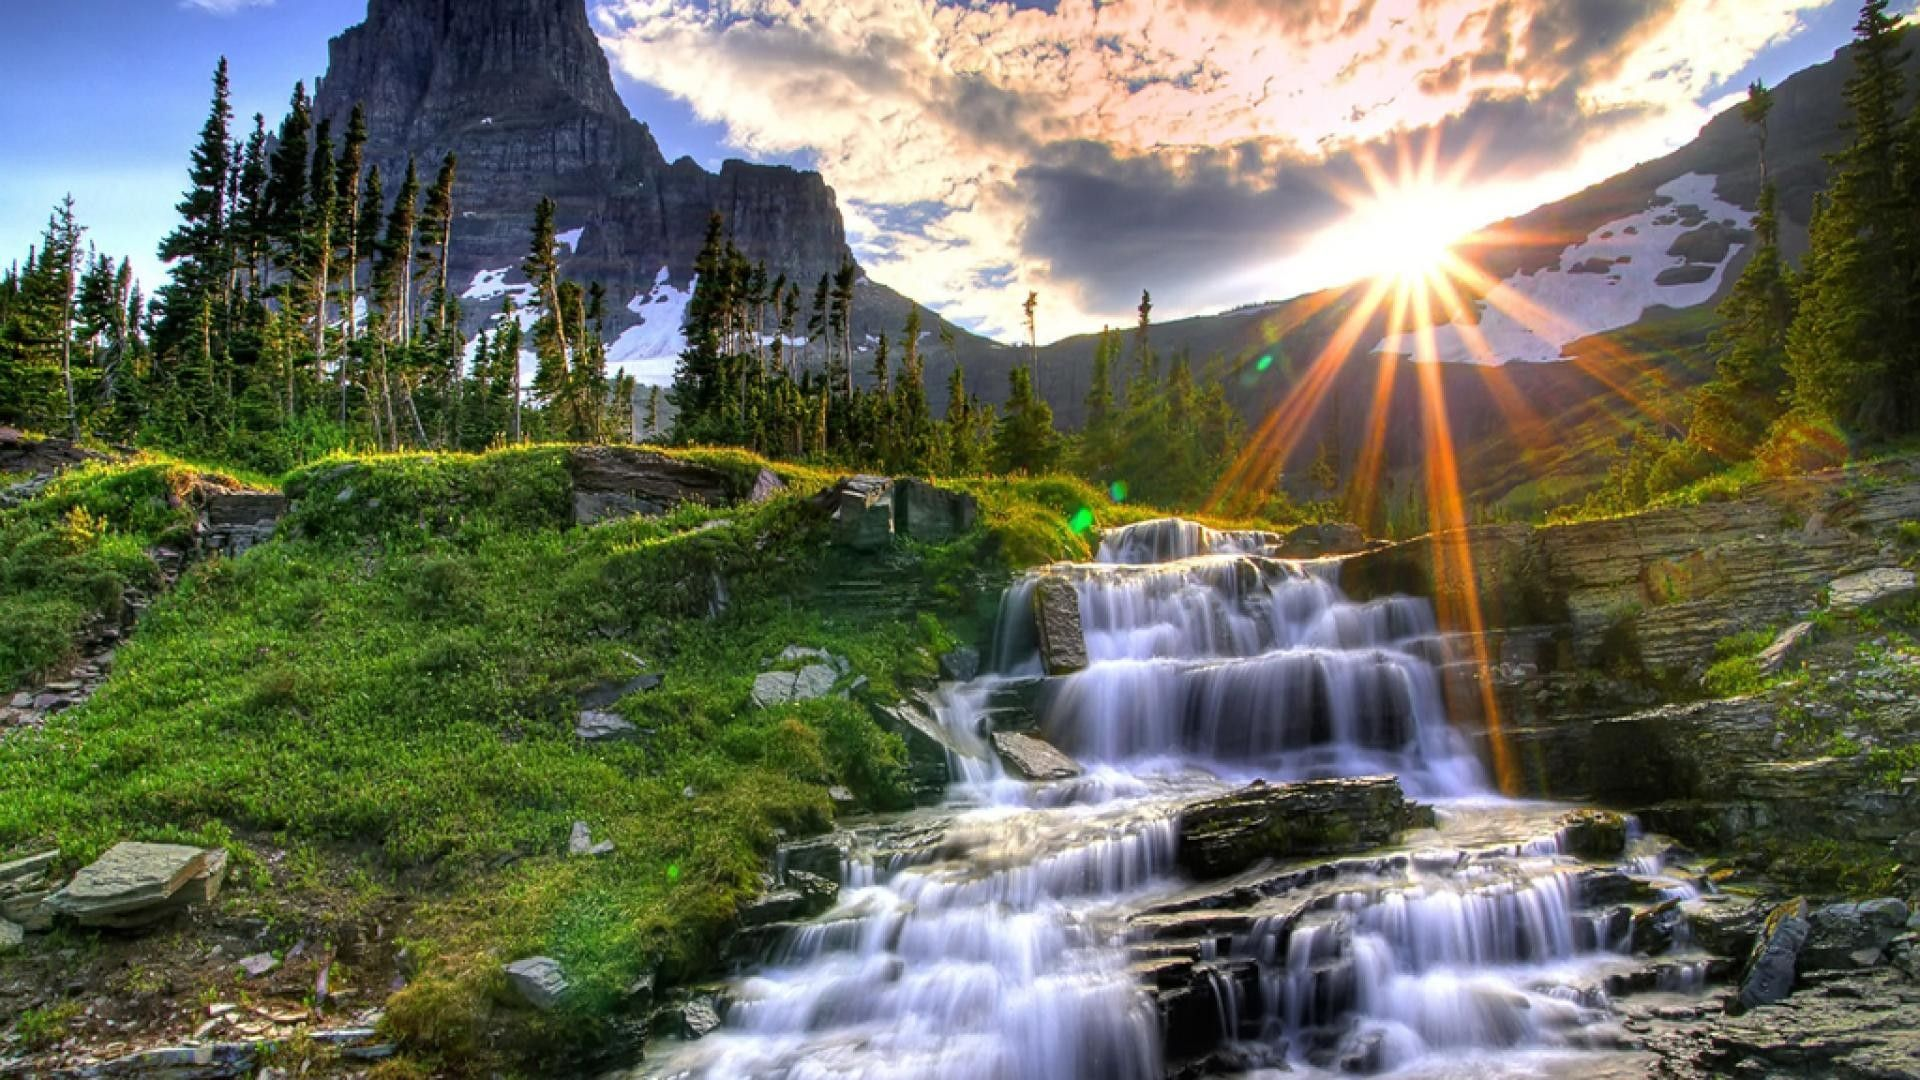 1920x1080 Hd Waterfall Wallpapers Top Free 1920x1080 Hd Waterfall Backgrounds Wallpaperaccess